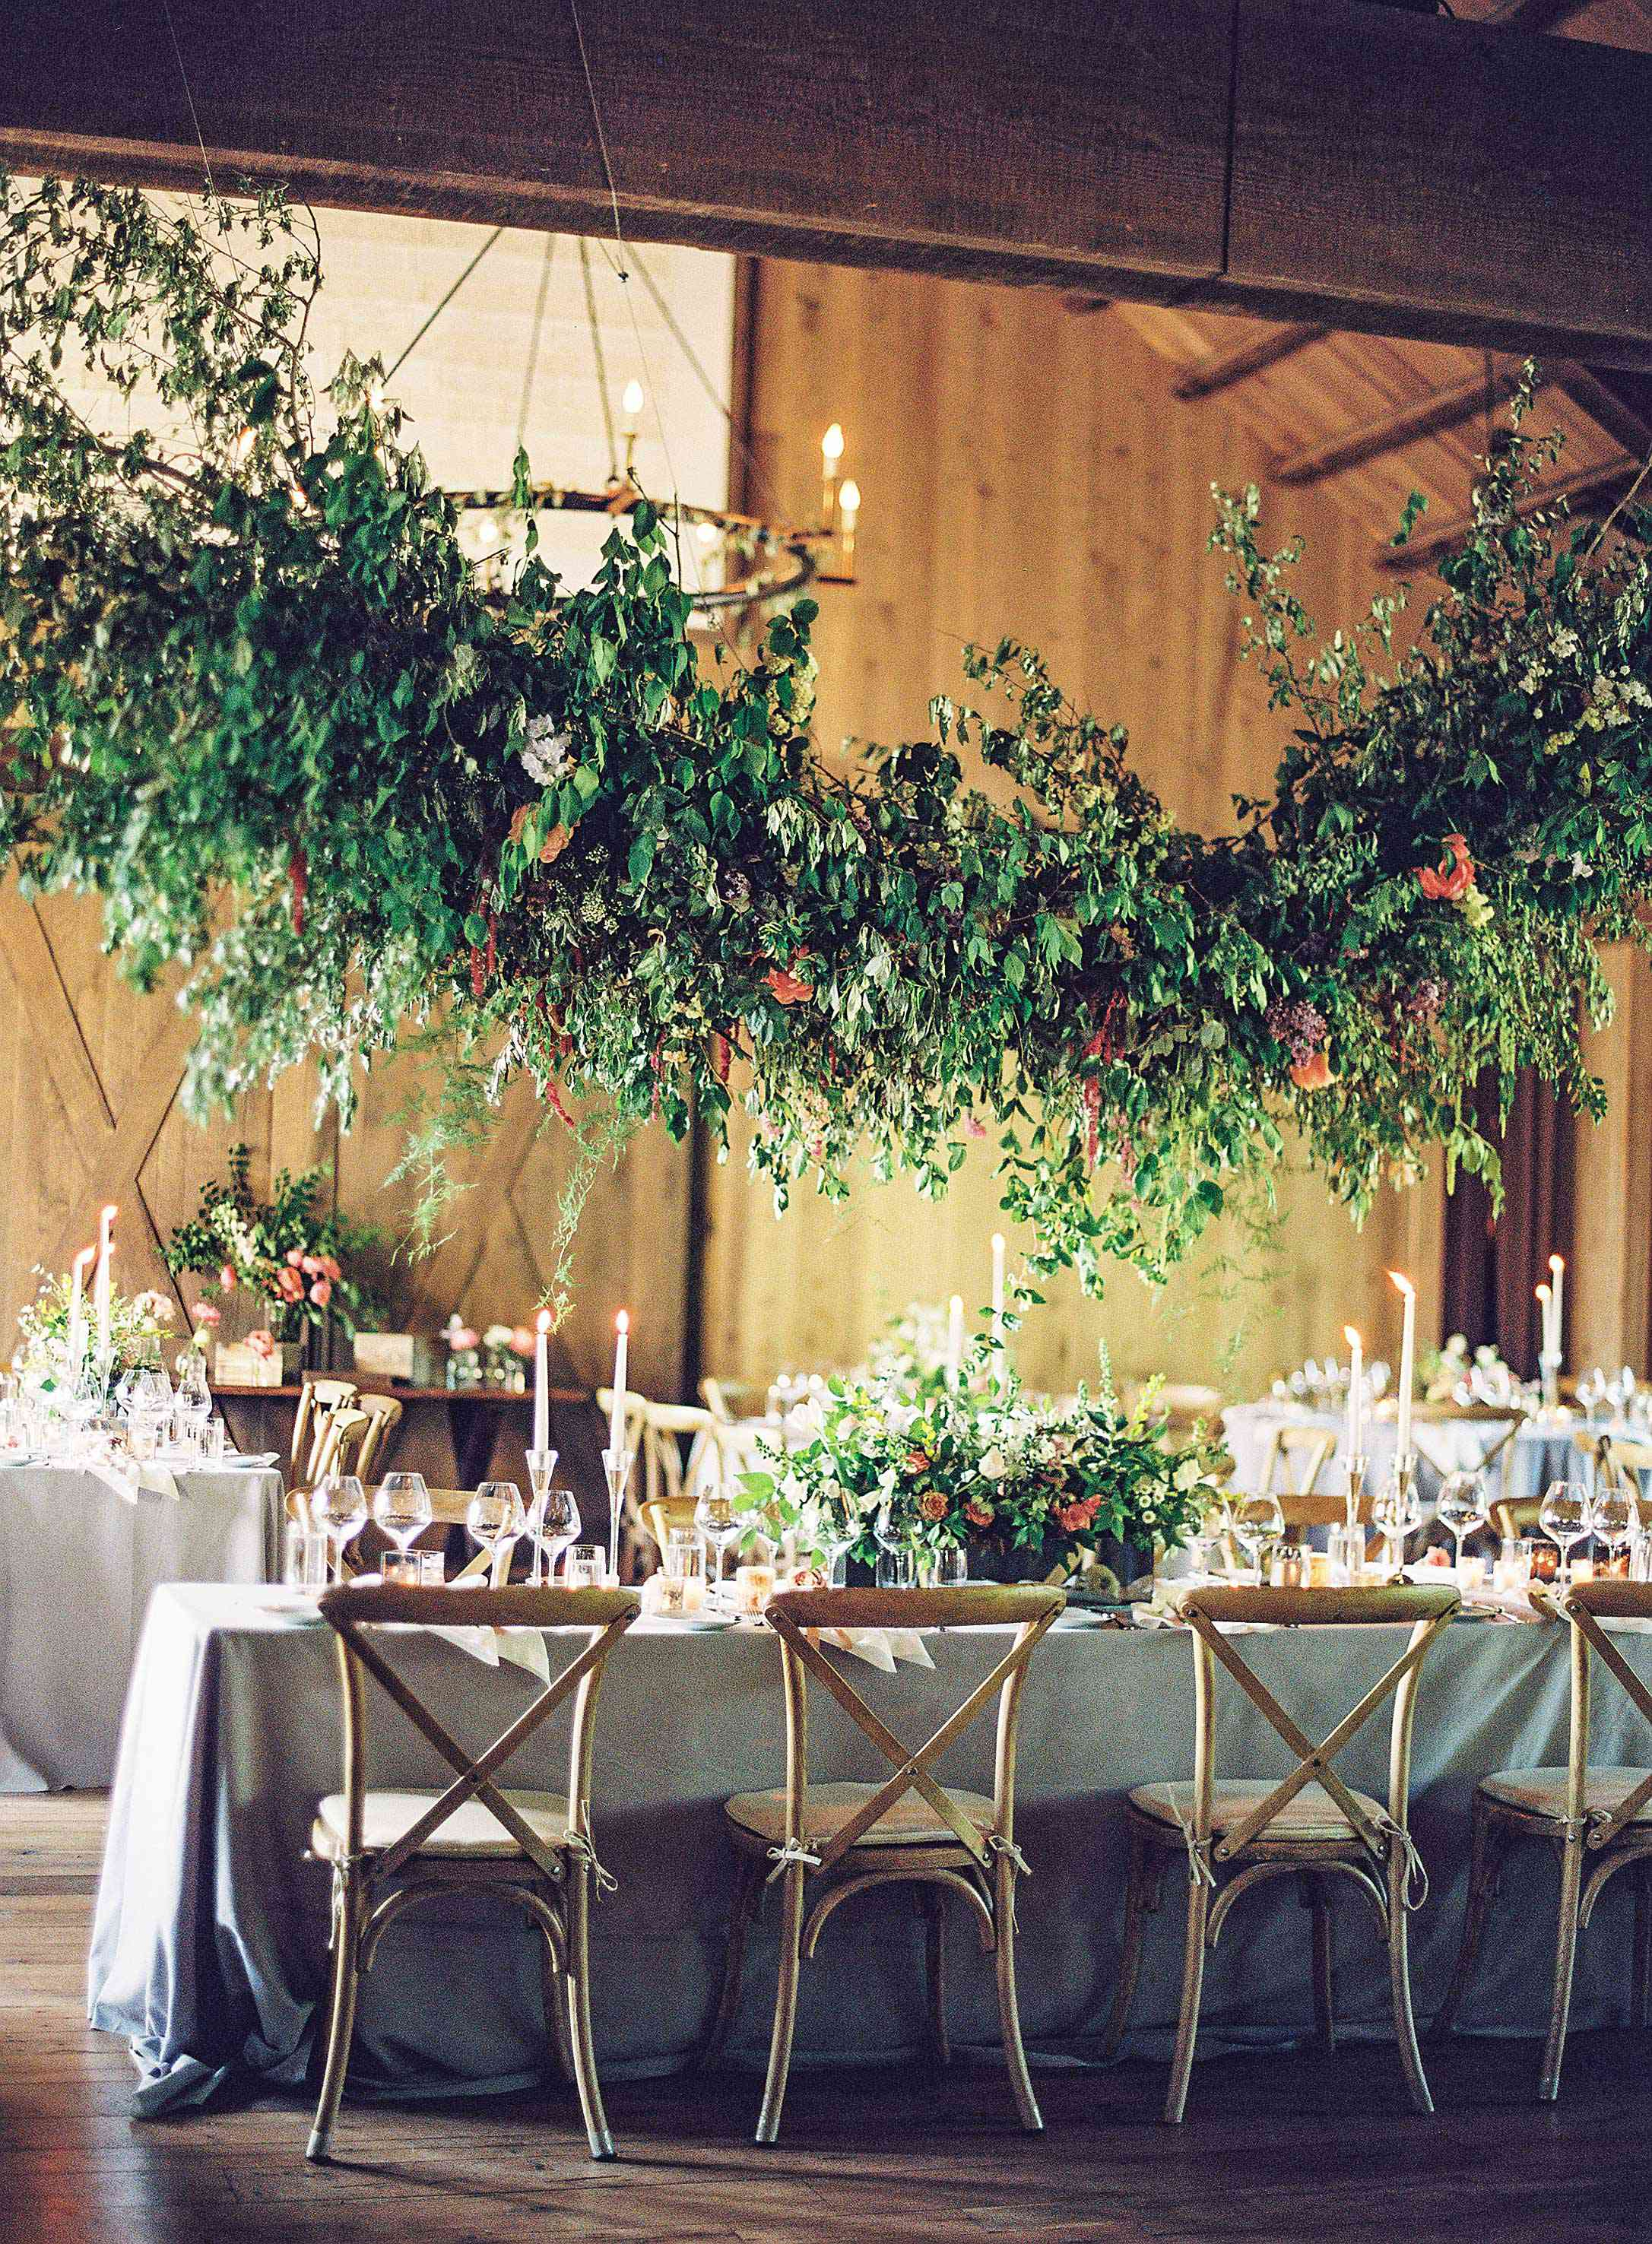 Fantastic 17 Fresh Ideas For A Fall Wedding Tablescape Short Links Chair Design For Home Short Linksinfo